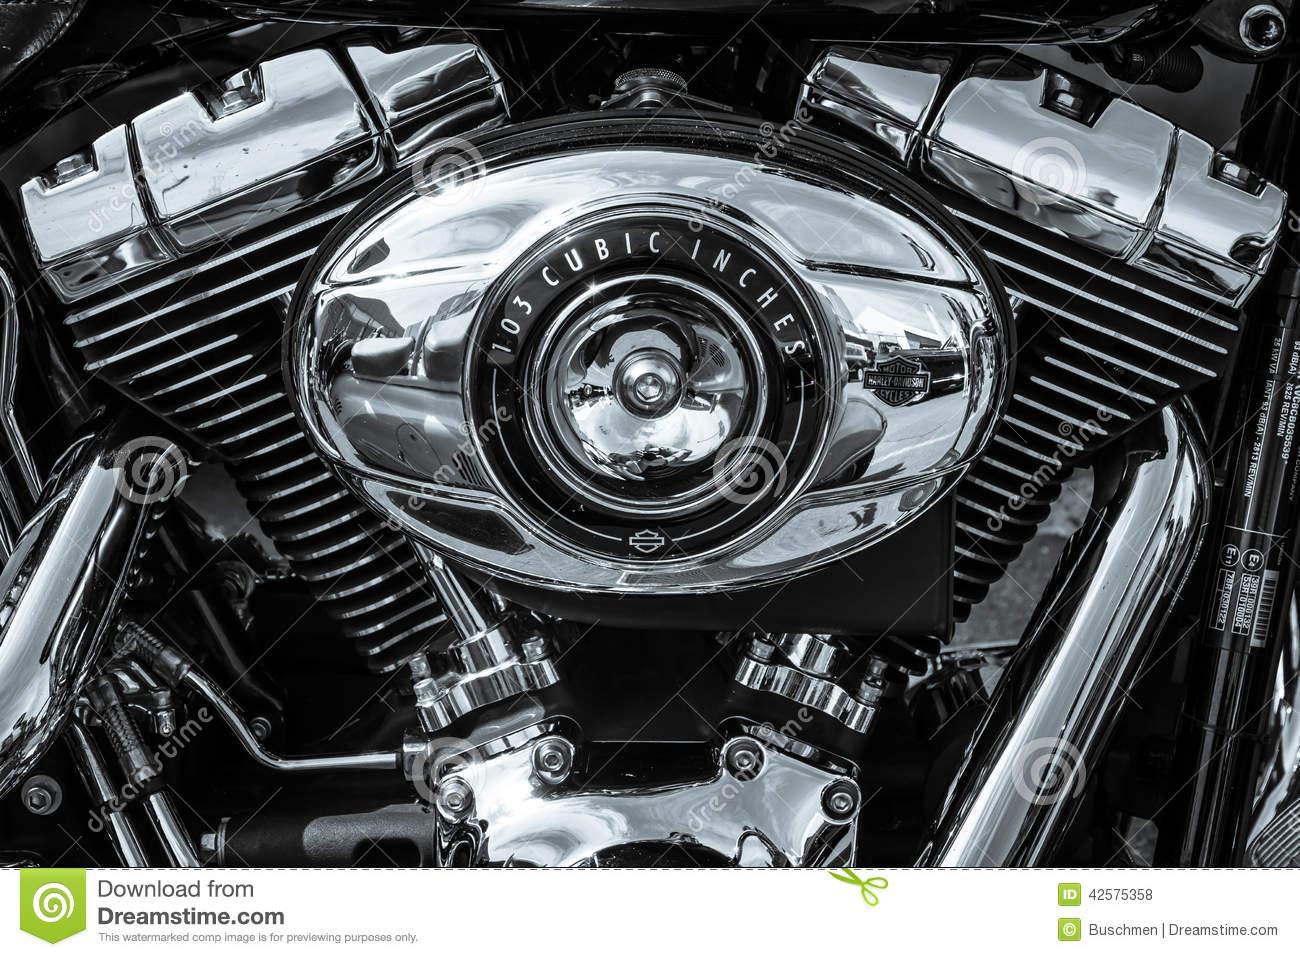 Strange Twin Cam 103 Engine Closeup Of Motorcycle Harley Davidson Softail Wiring Cloud Waroletkolfr09Org